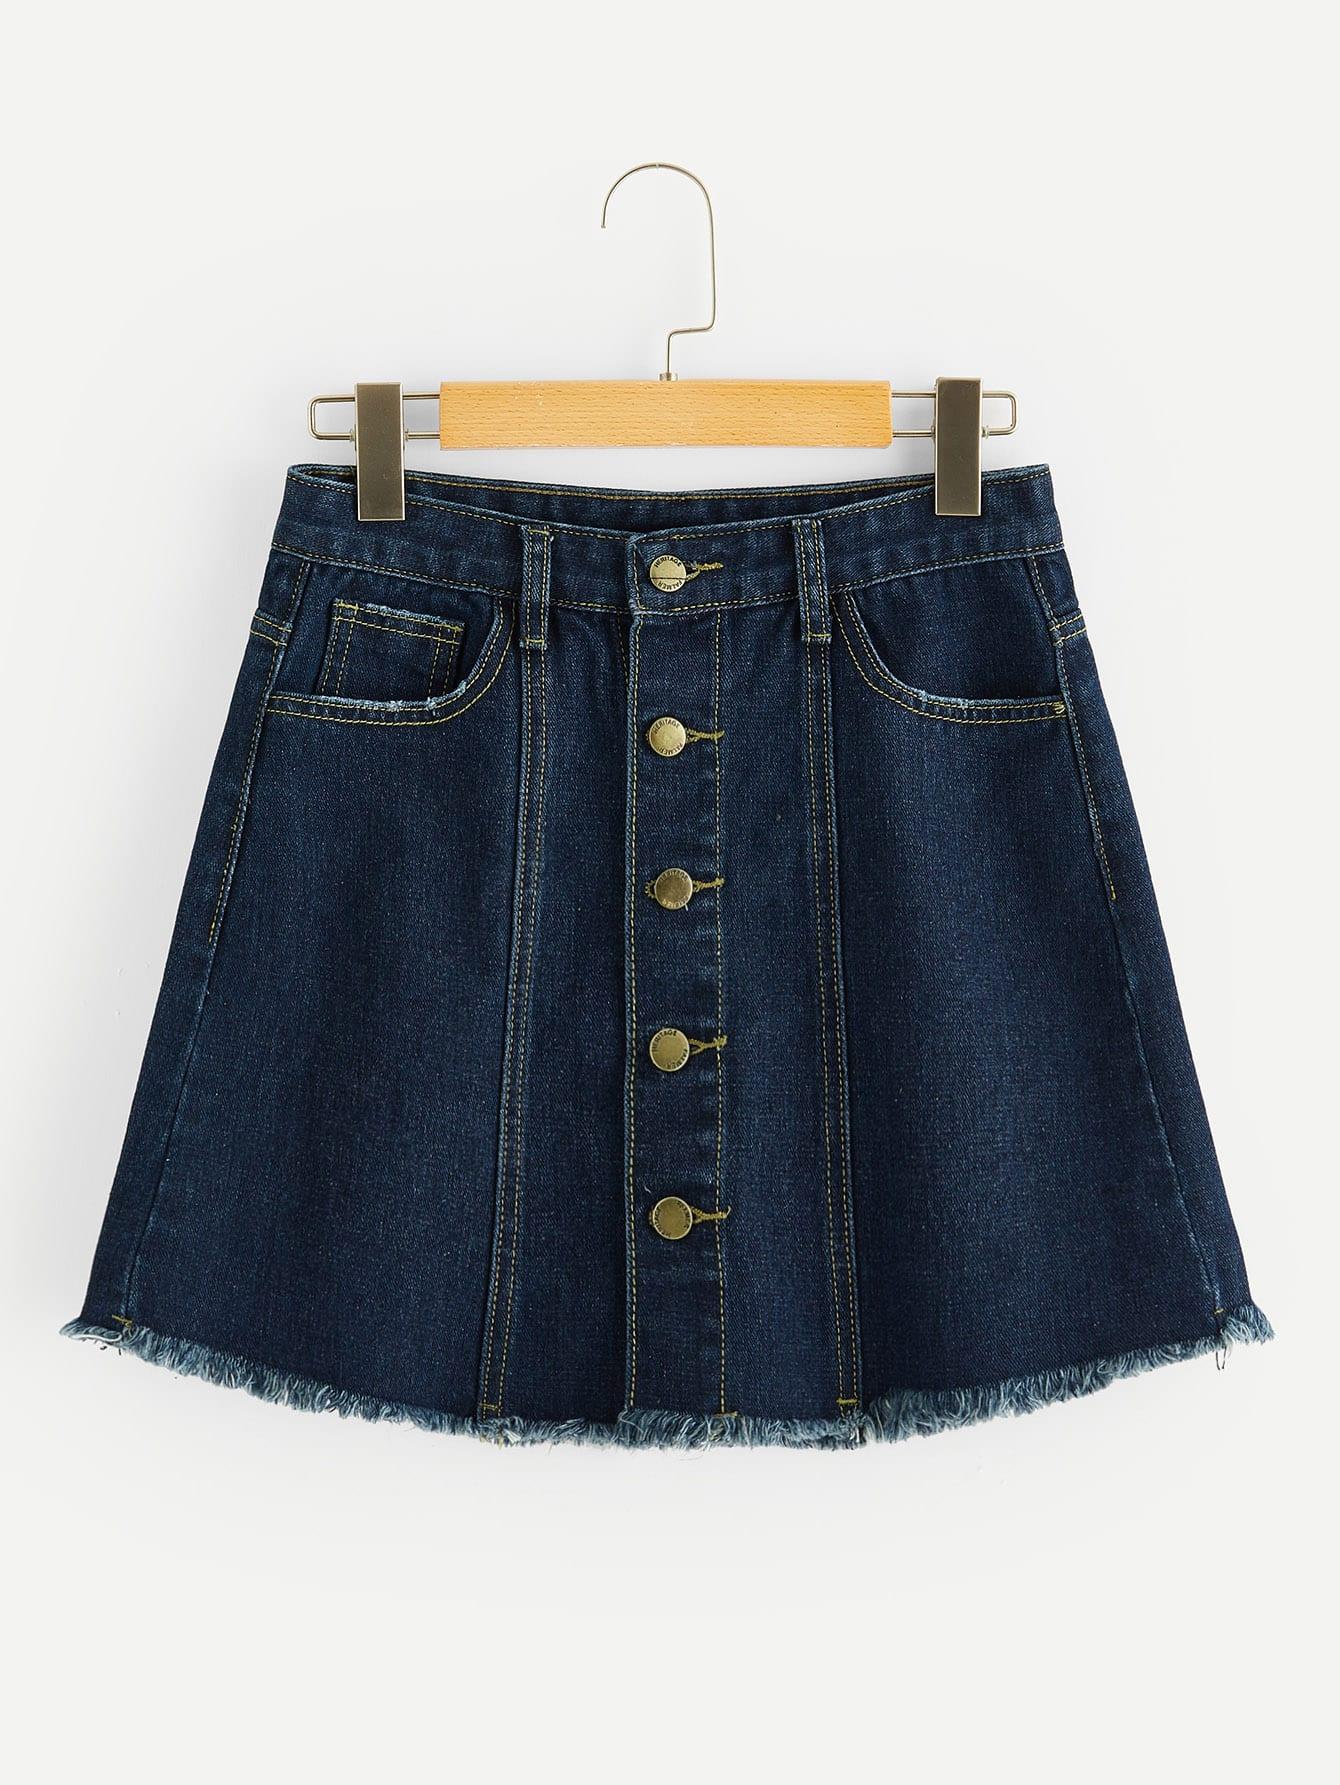 Фото - Джинсовая юбка на пуговицах с карманами от SheIn цвет темно синий